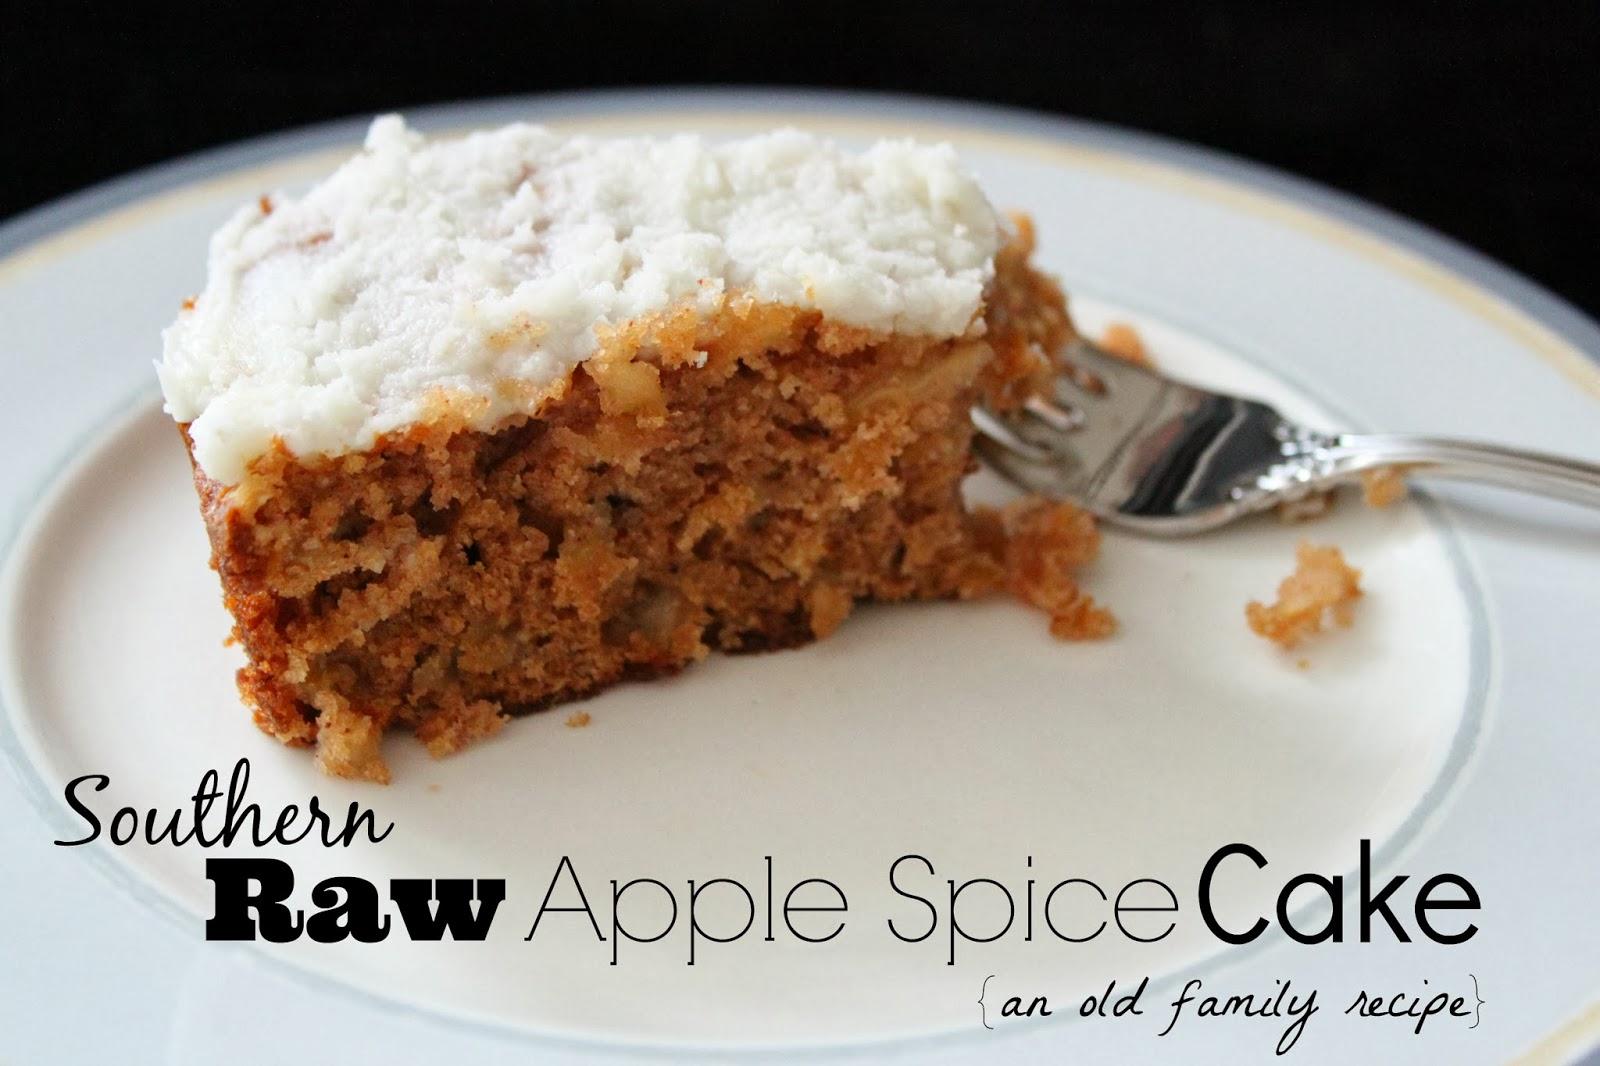 Sourthern Raw Apple Spice Cake